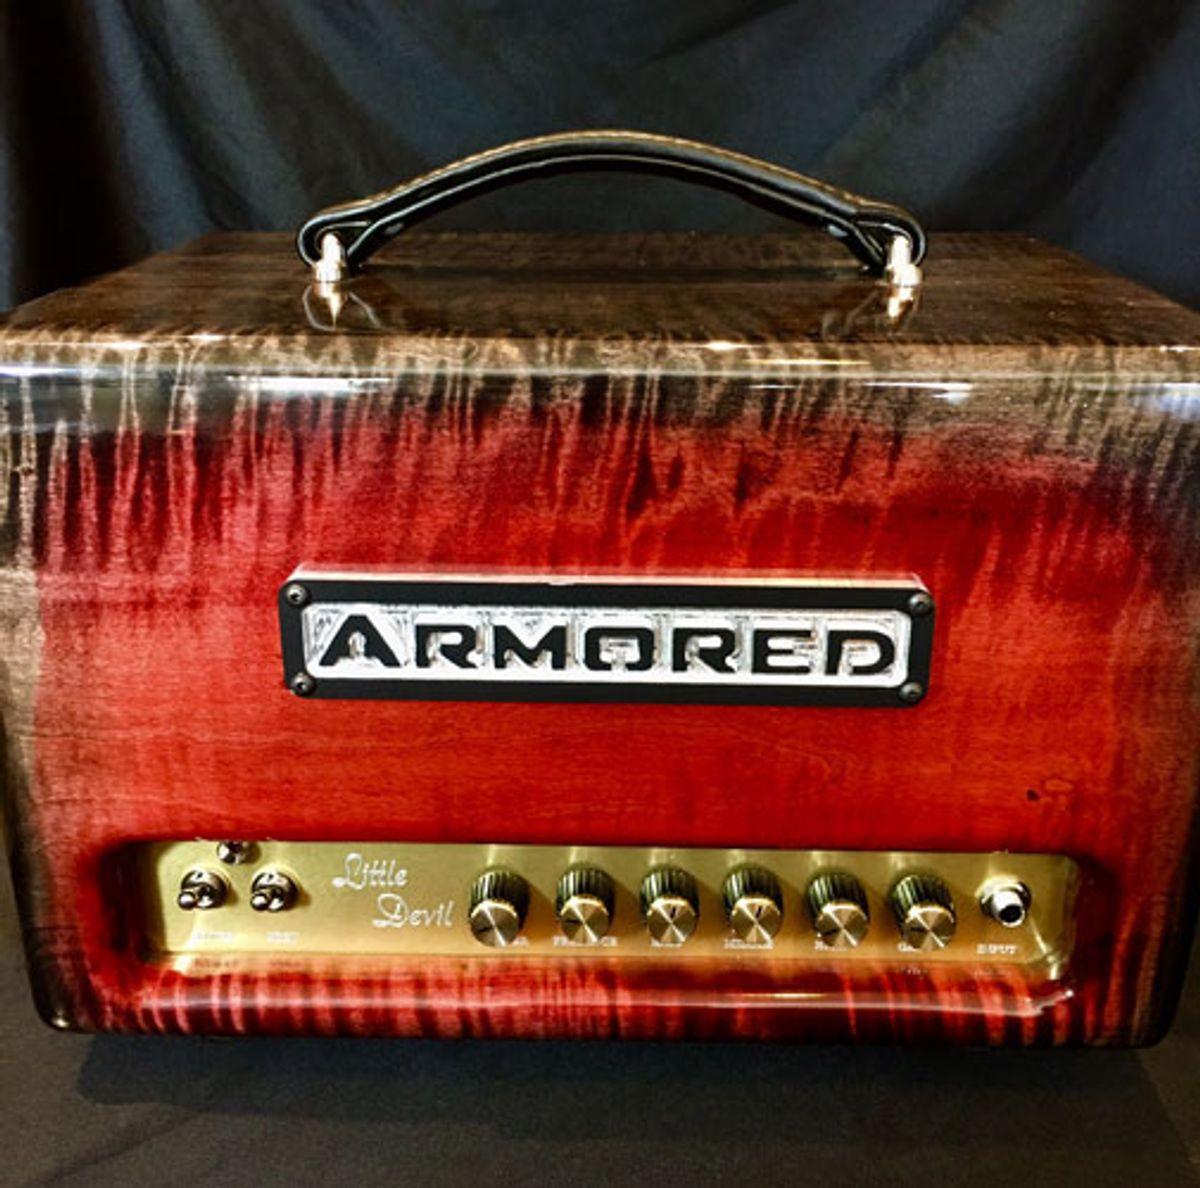 Armored Amplification Unveils the Little Devil